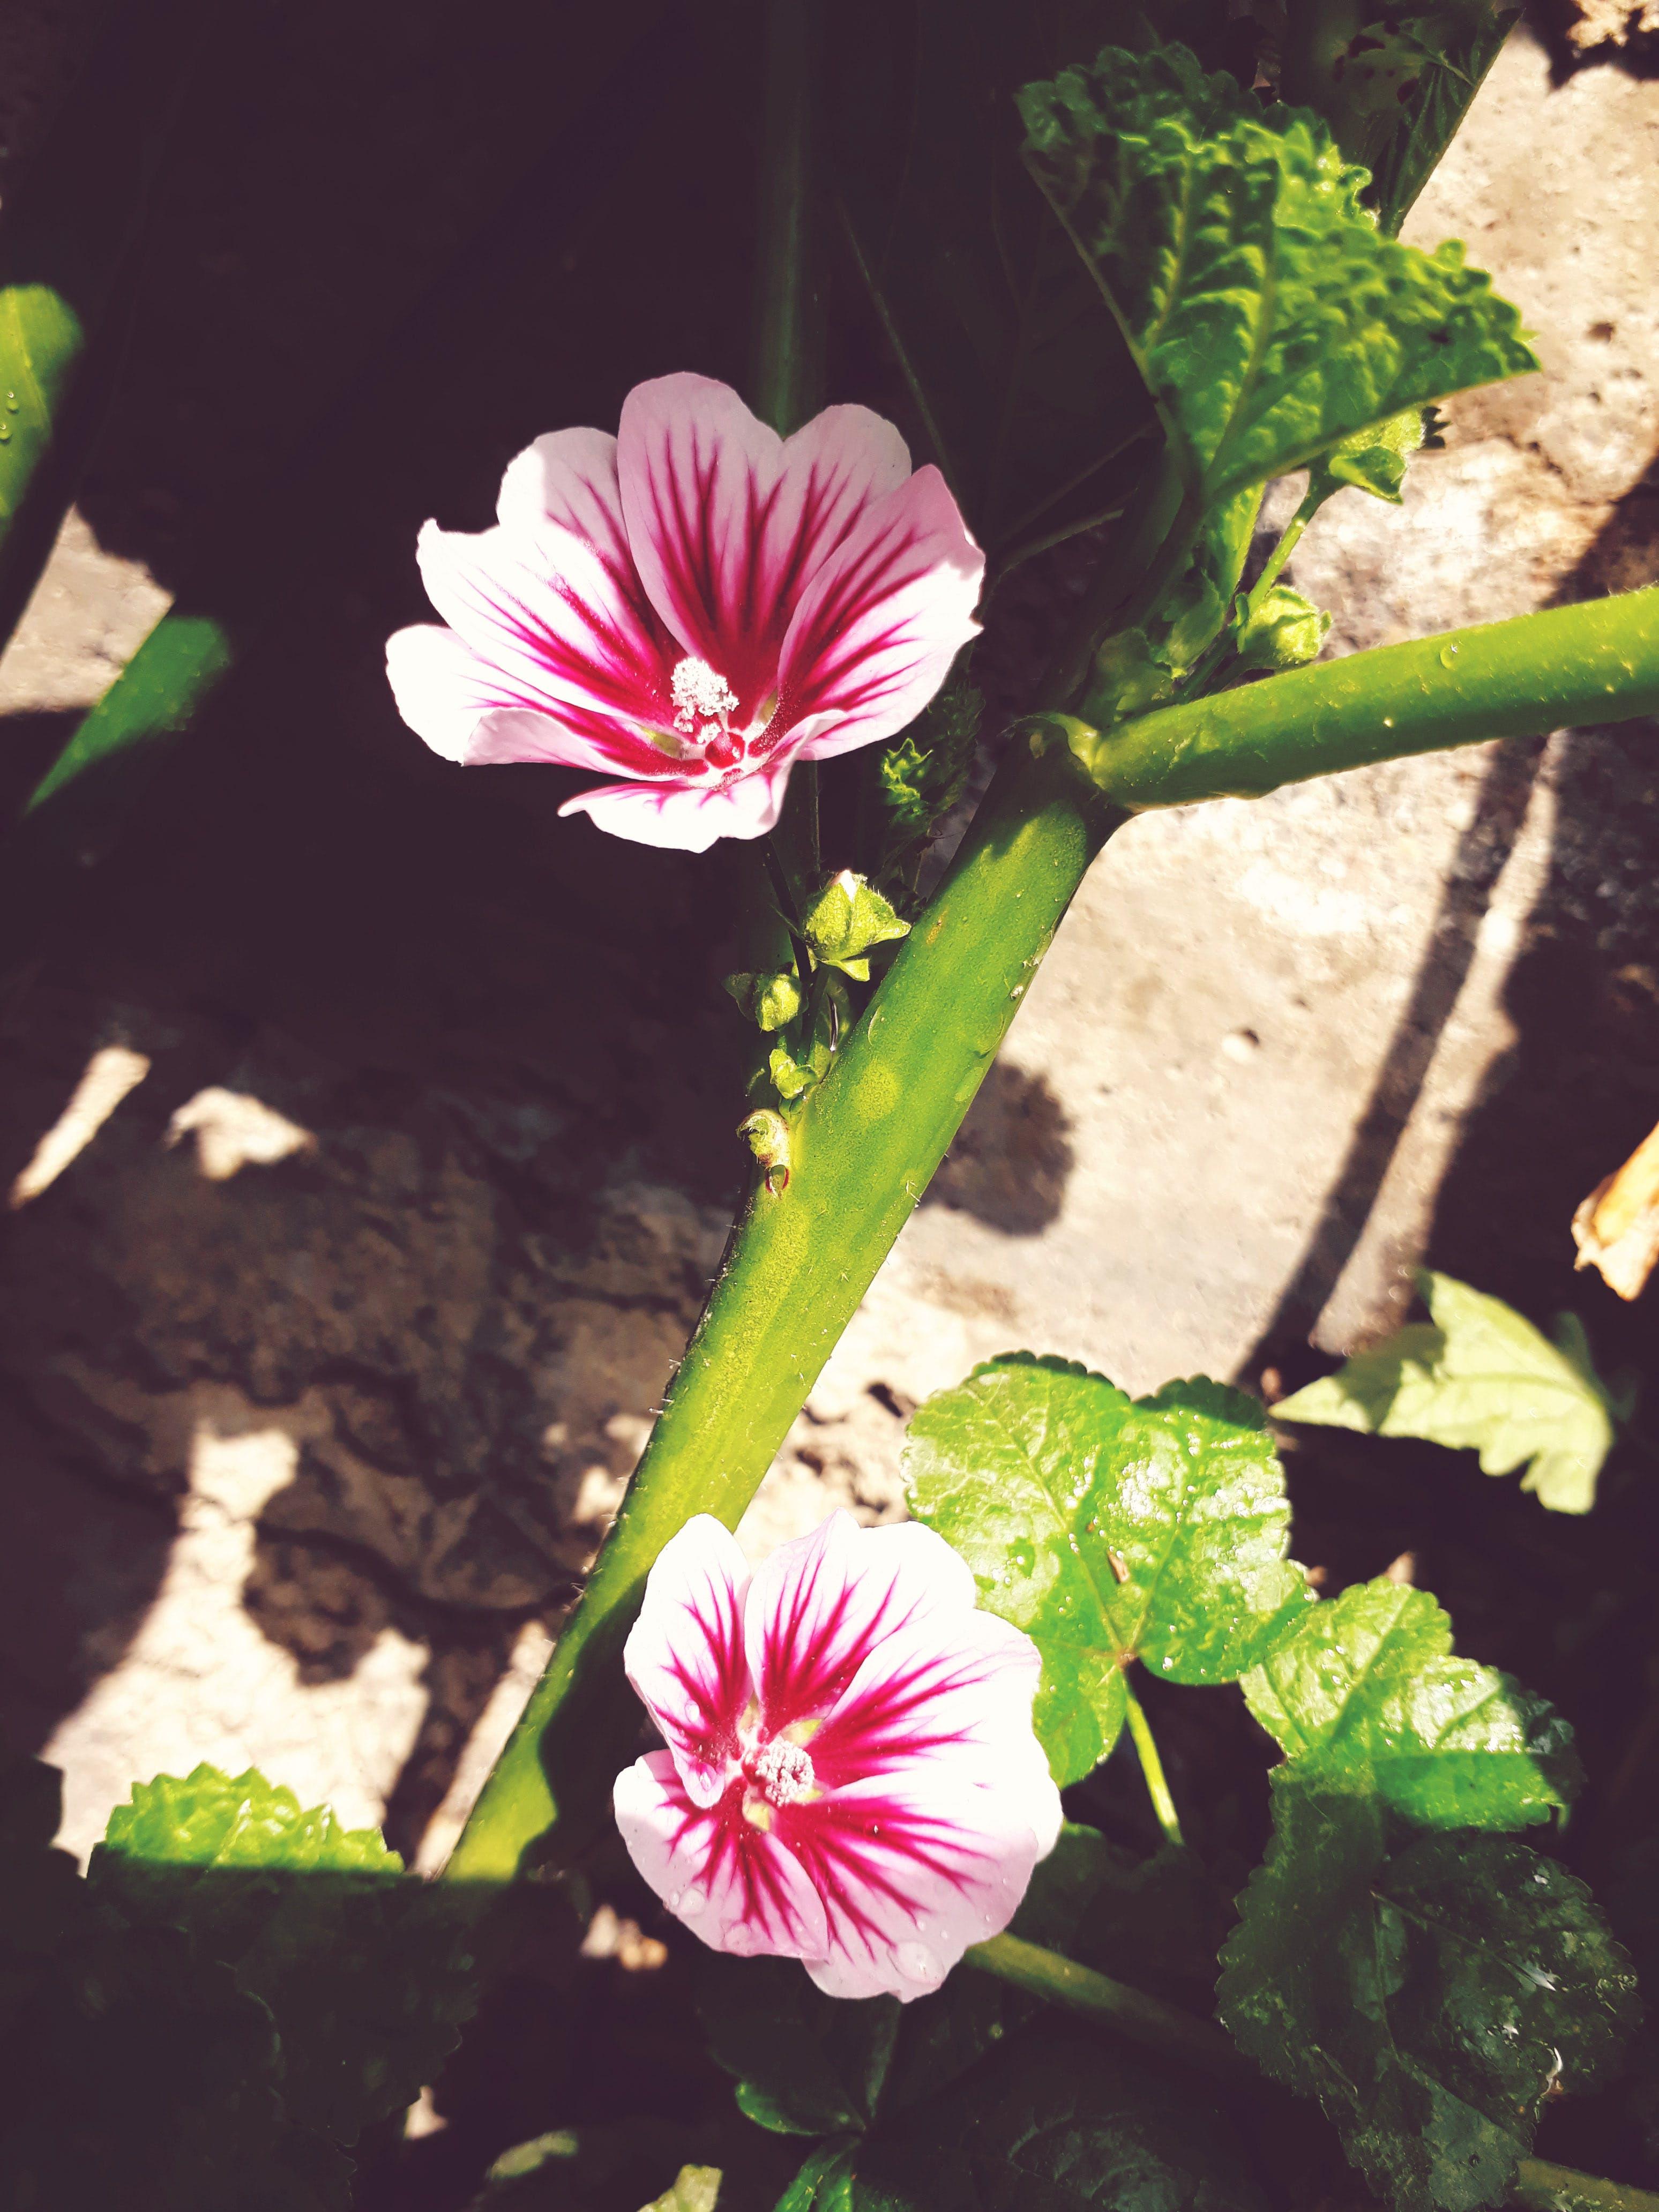 Free stock photo of flower, malvaceae, pink flower, wild flower